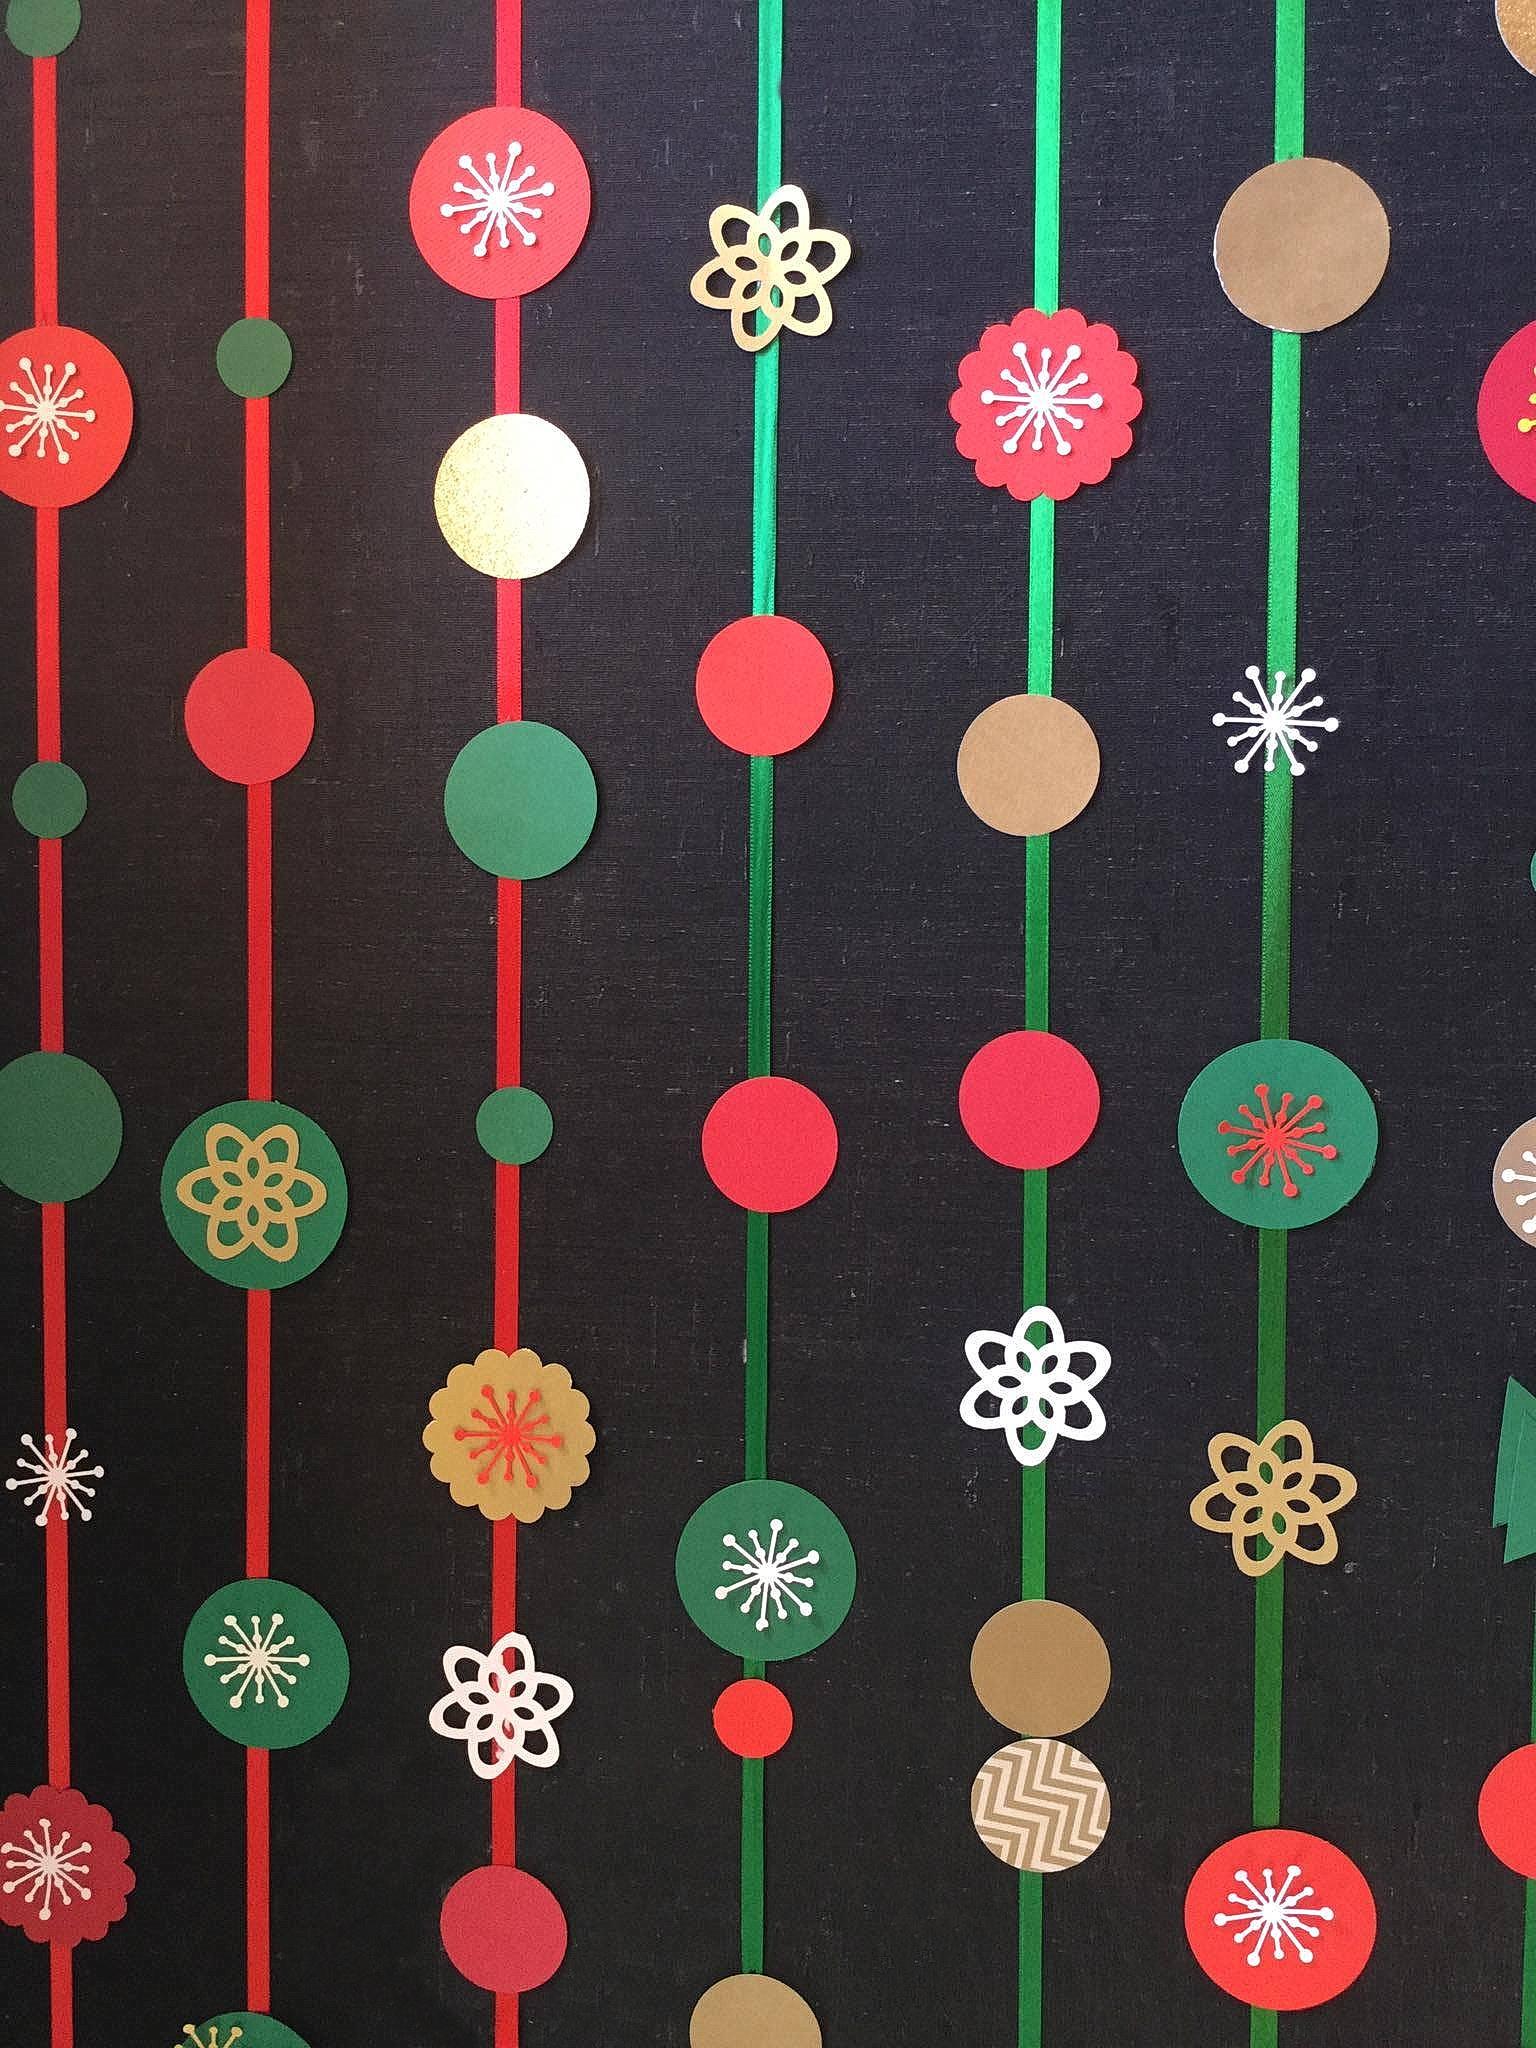 e253580647 Decoracao Natal Luxo Fioratas e Varal Natal